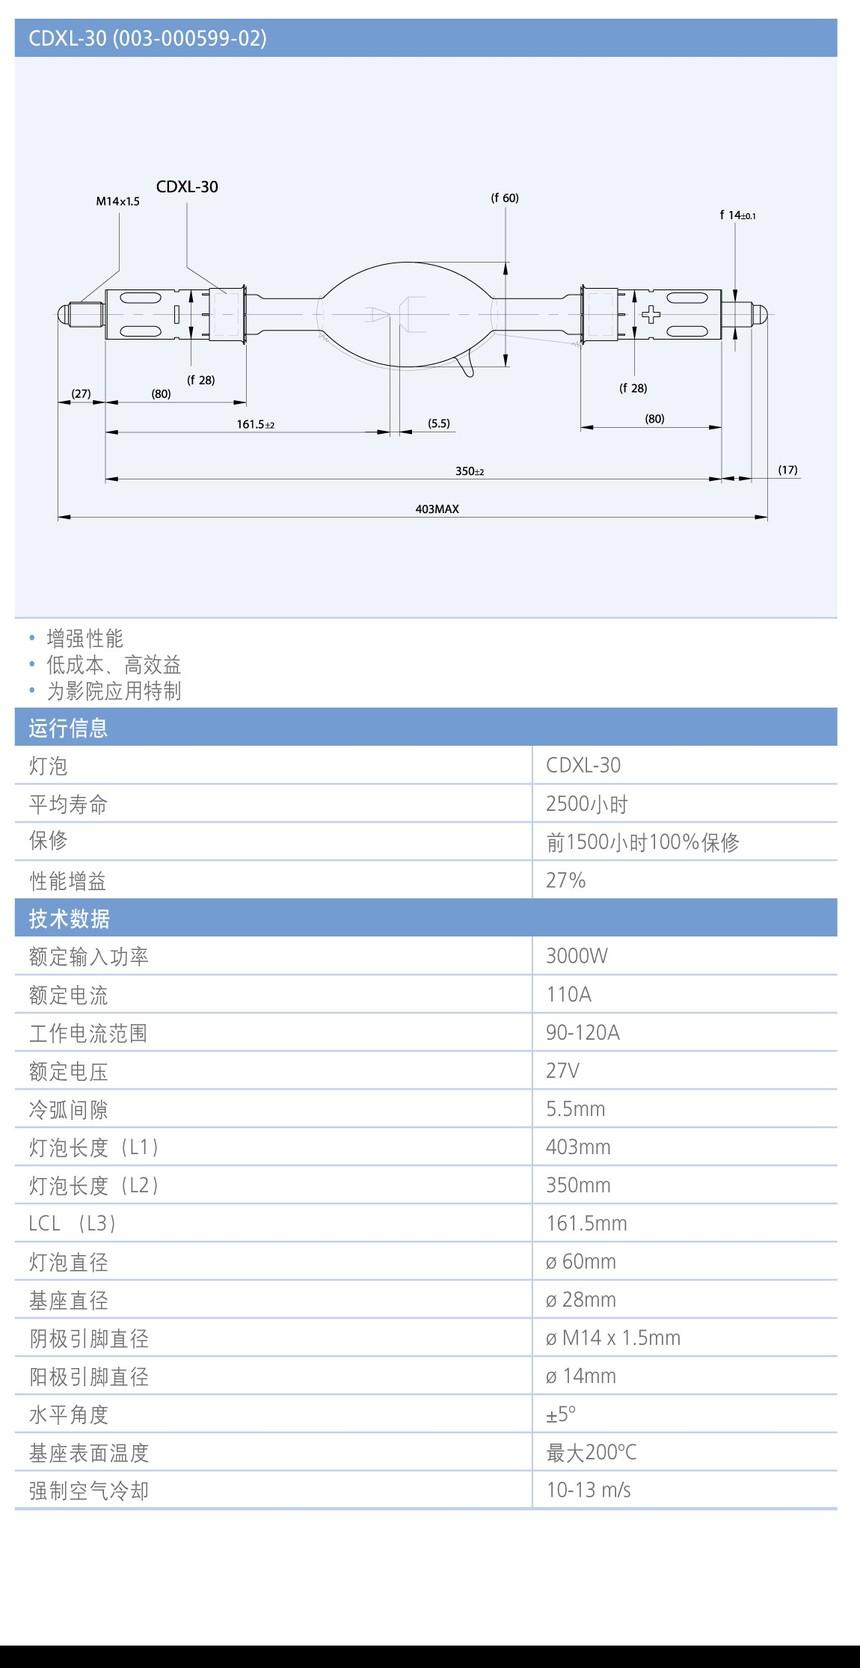 CDXL-30.jpg